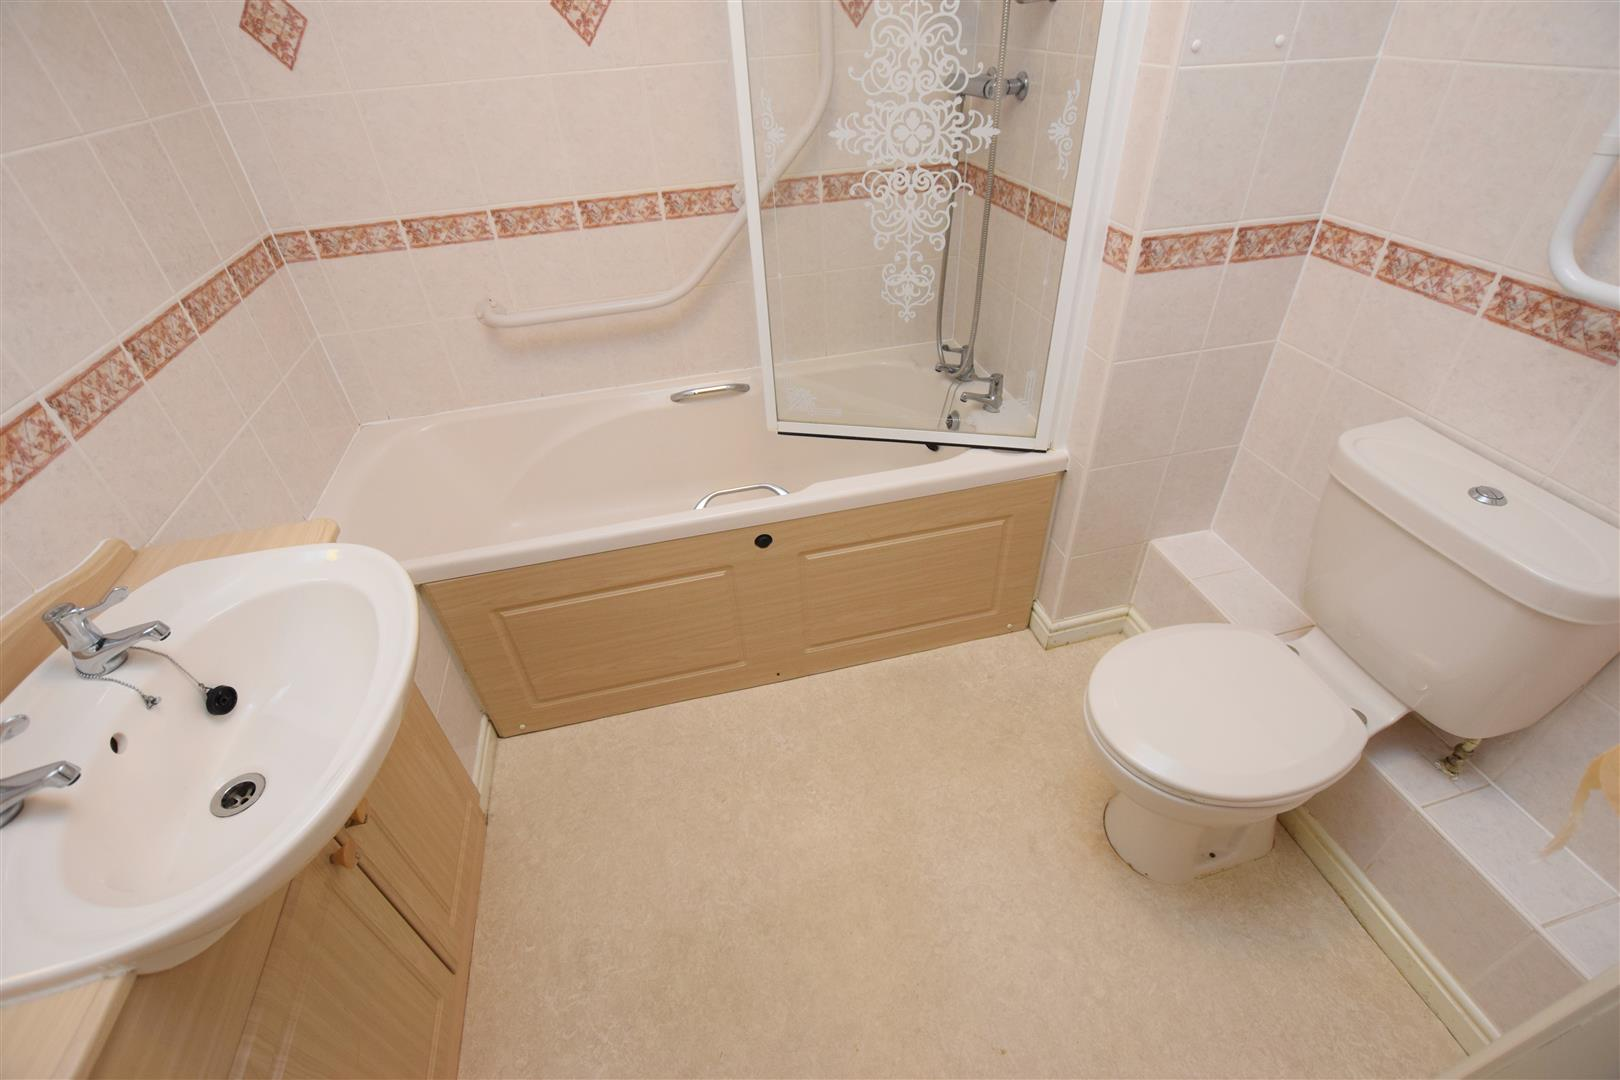 Flat 11, Ericht Court, Upper Mill Street, Blairgowrie, Perthshire, PH10 6AE, UK